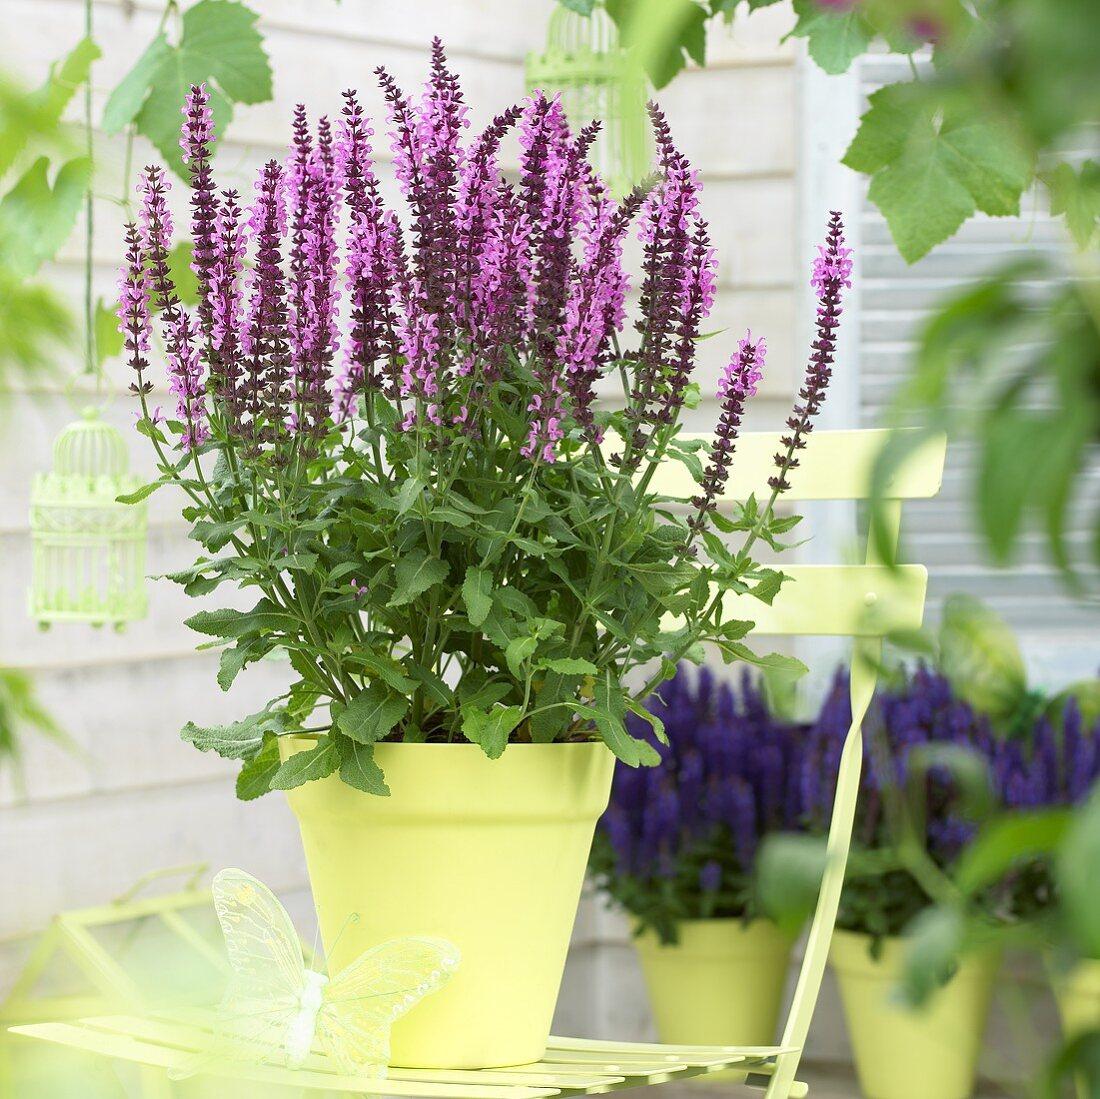 Salvia nemorosa 'Sensation Deep Rose' in flowerpot